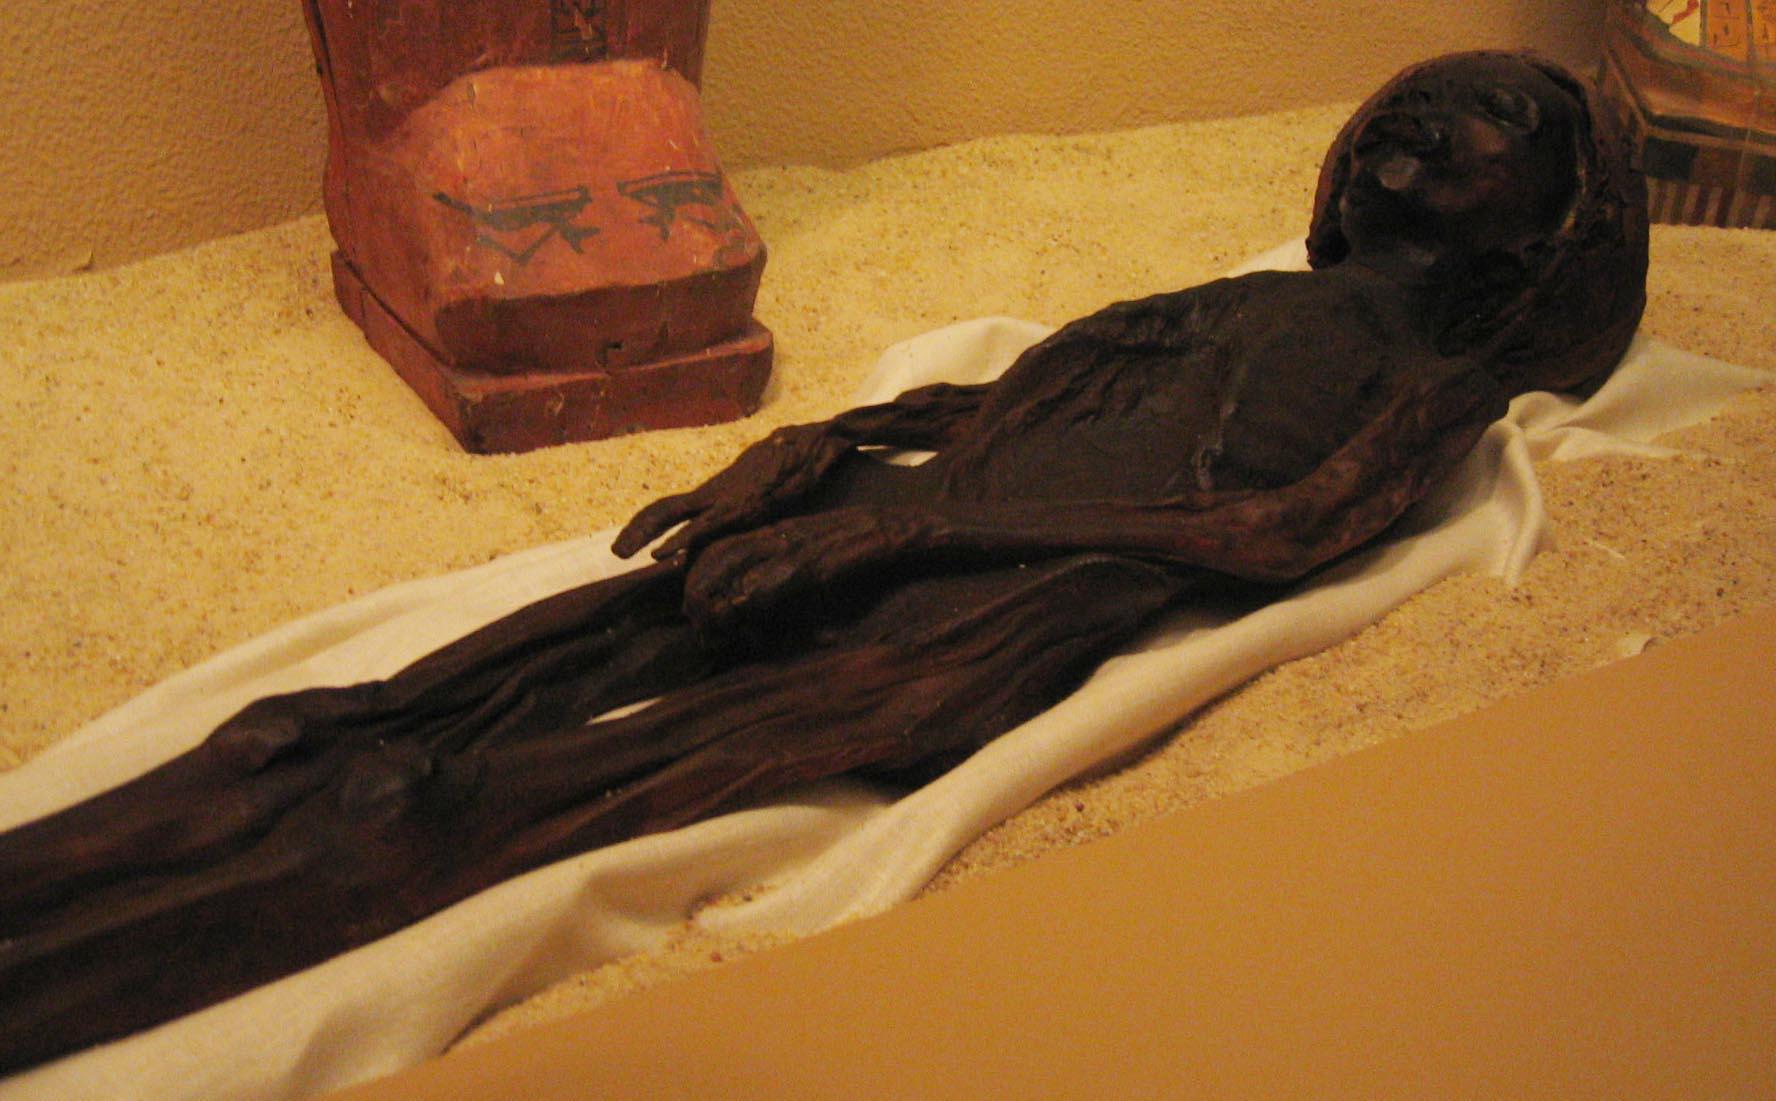 Mummy With Erect Penis